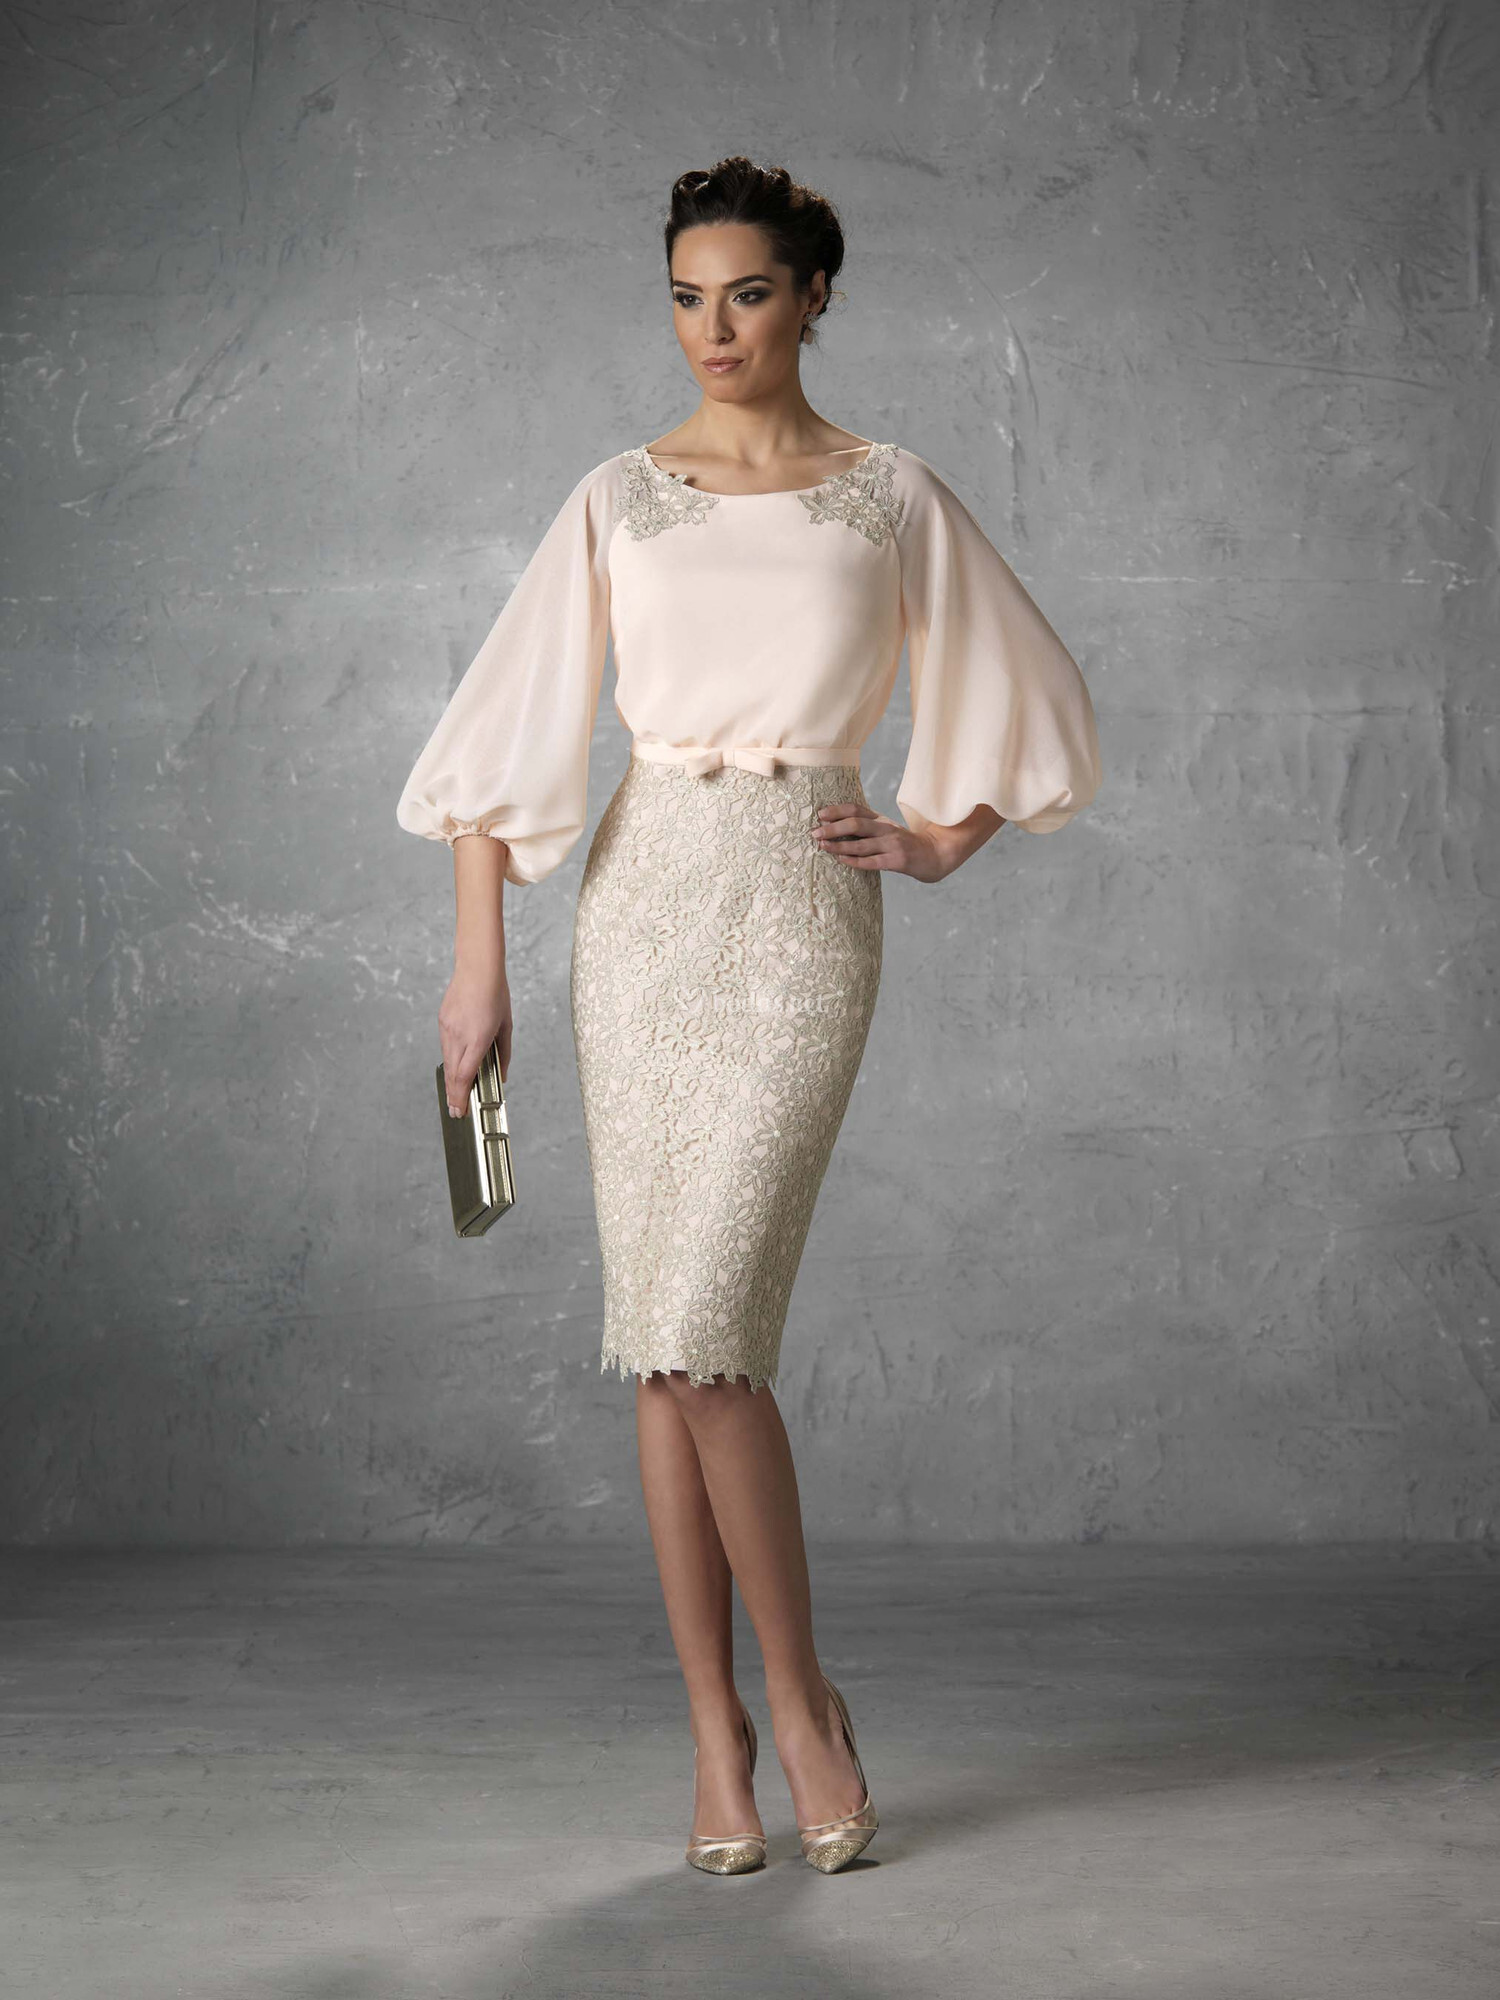 Precios vestidos fiesta raffaello